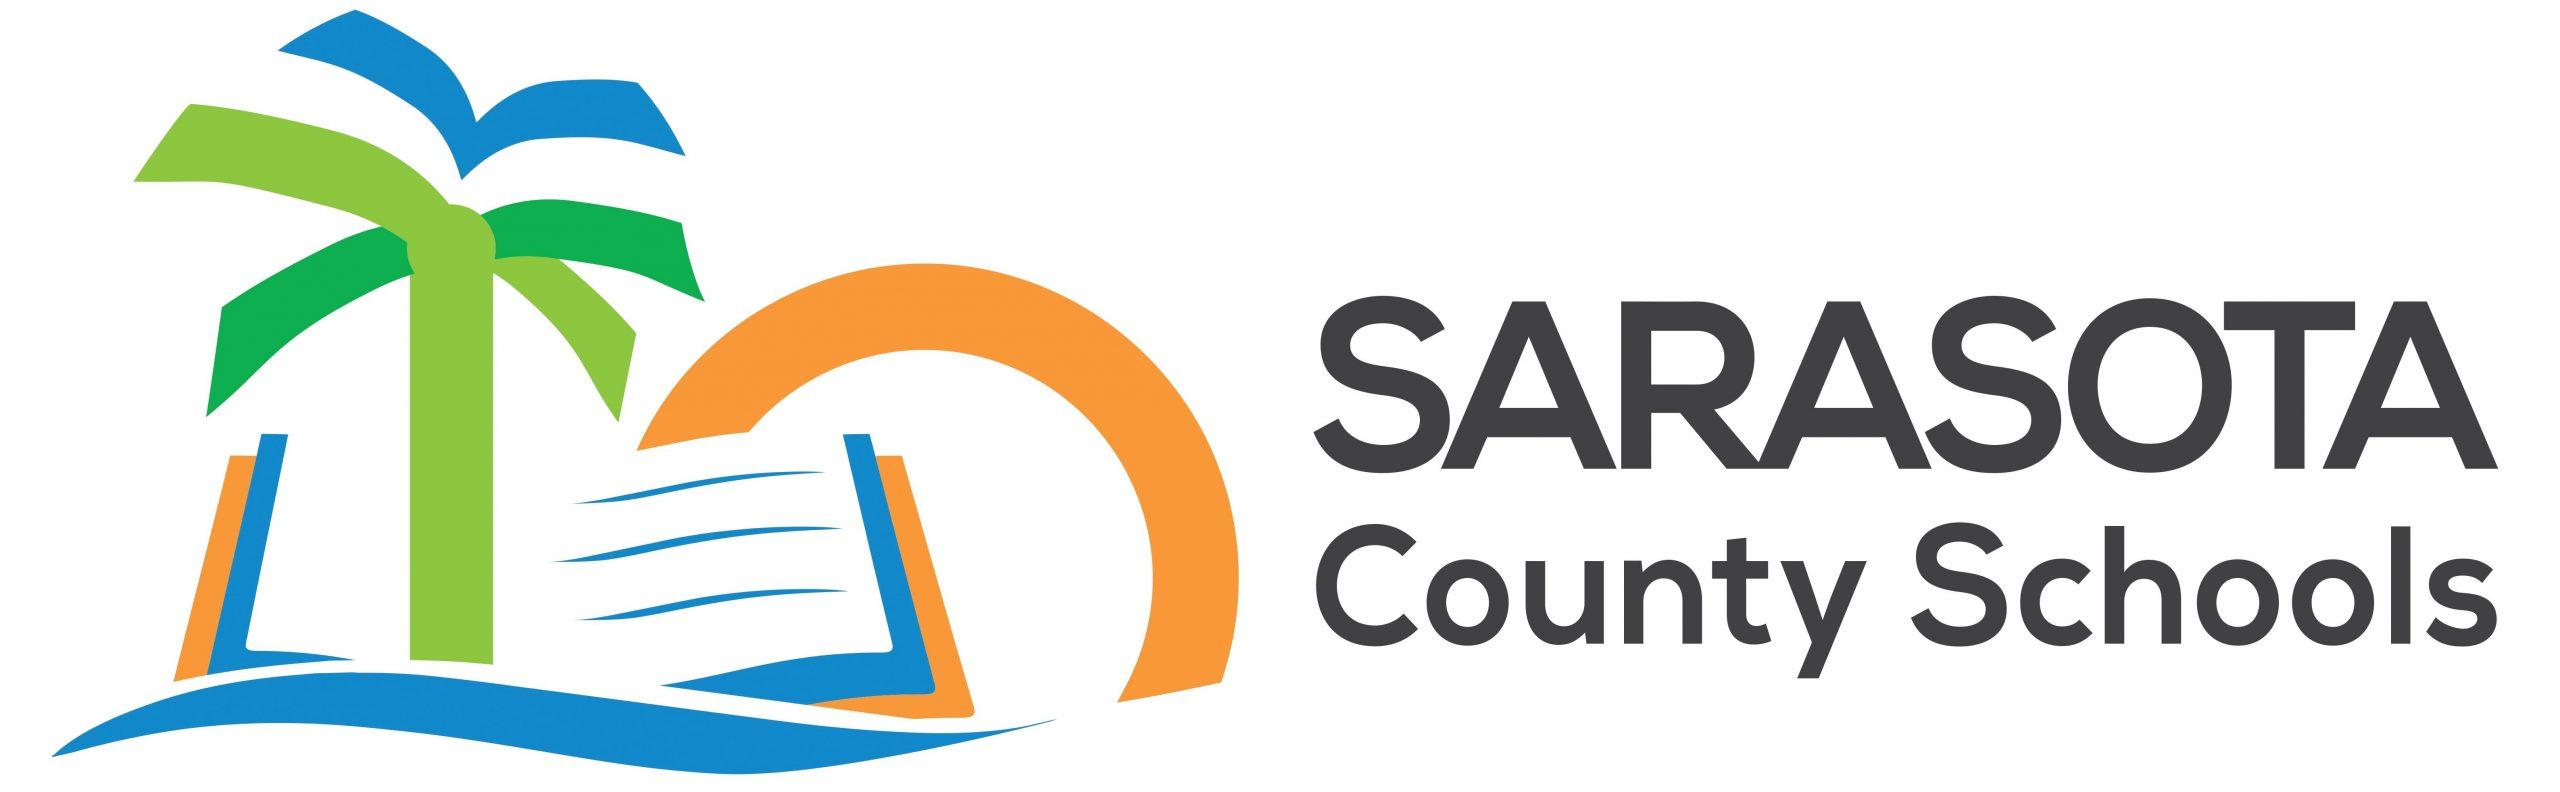 Sarasota County Schools